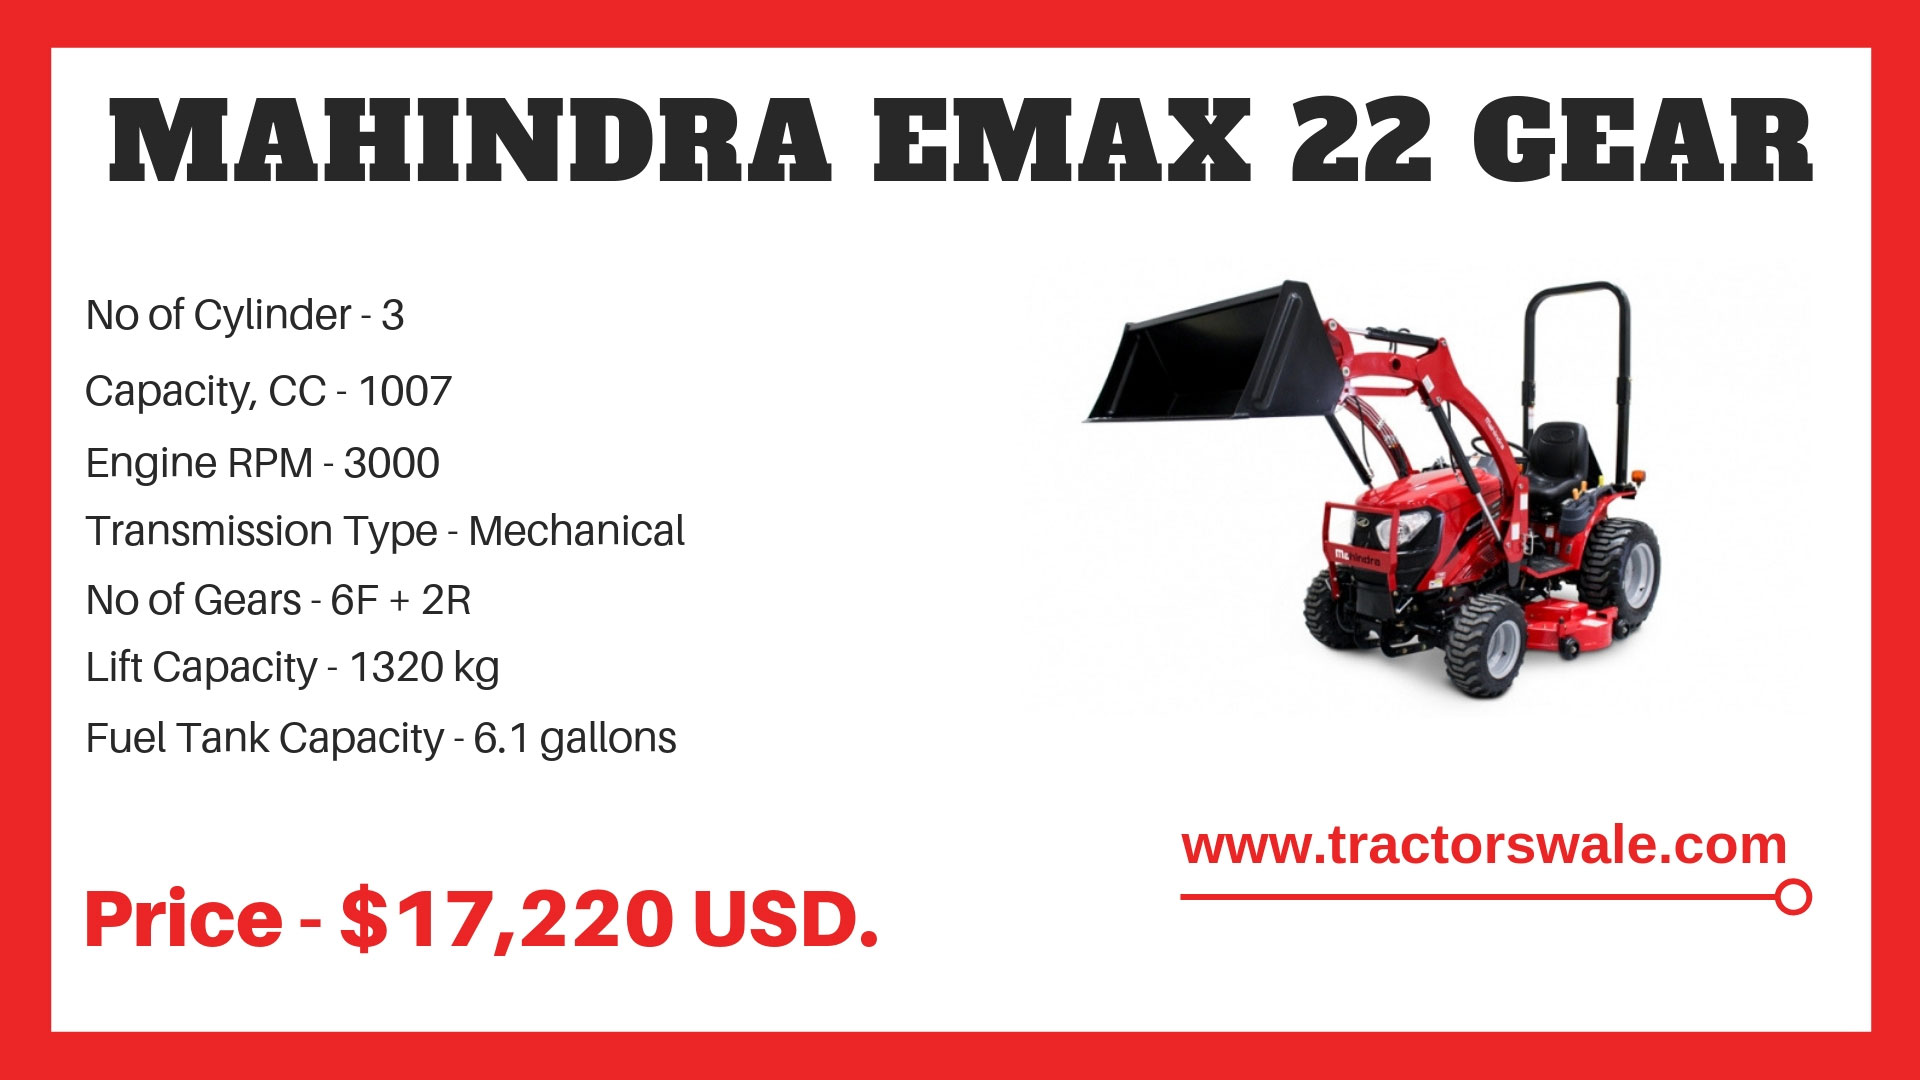 Mahindra-Emax-22-Gear-Mini-Tractor-Specifications